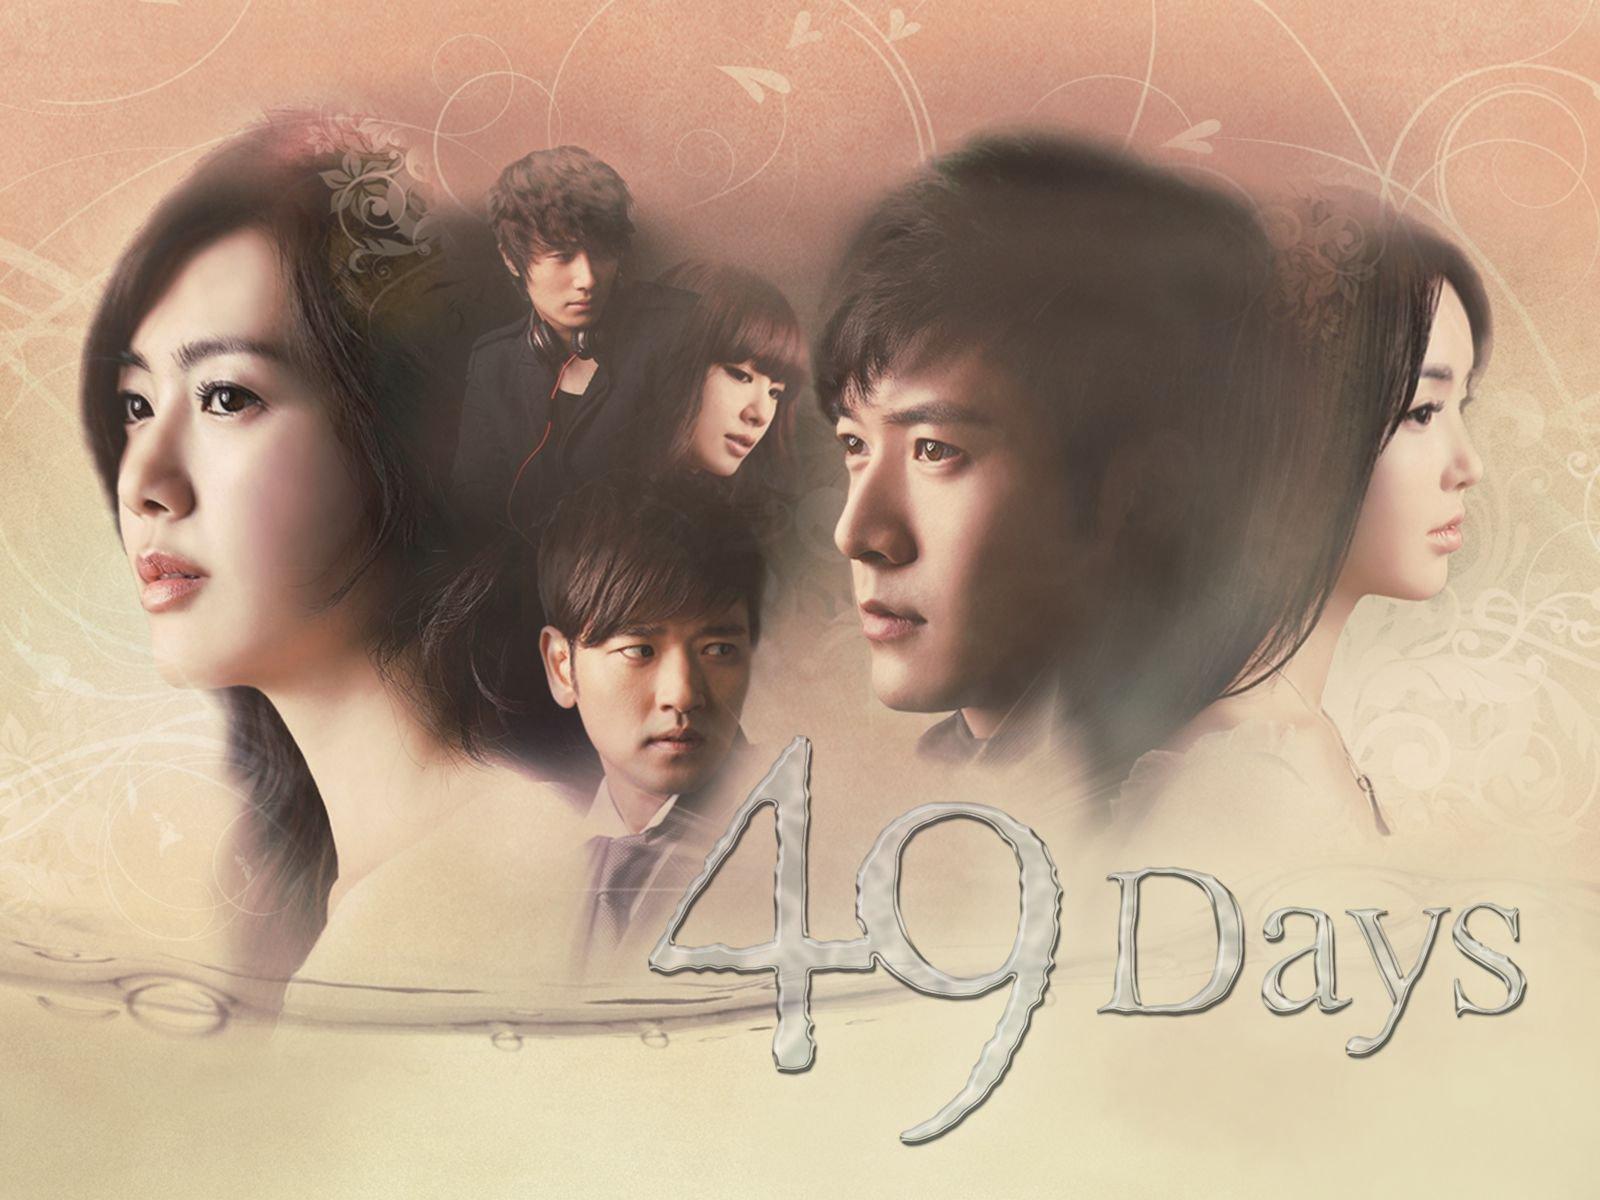 Ost 49 days nam gyu ri dating